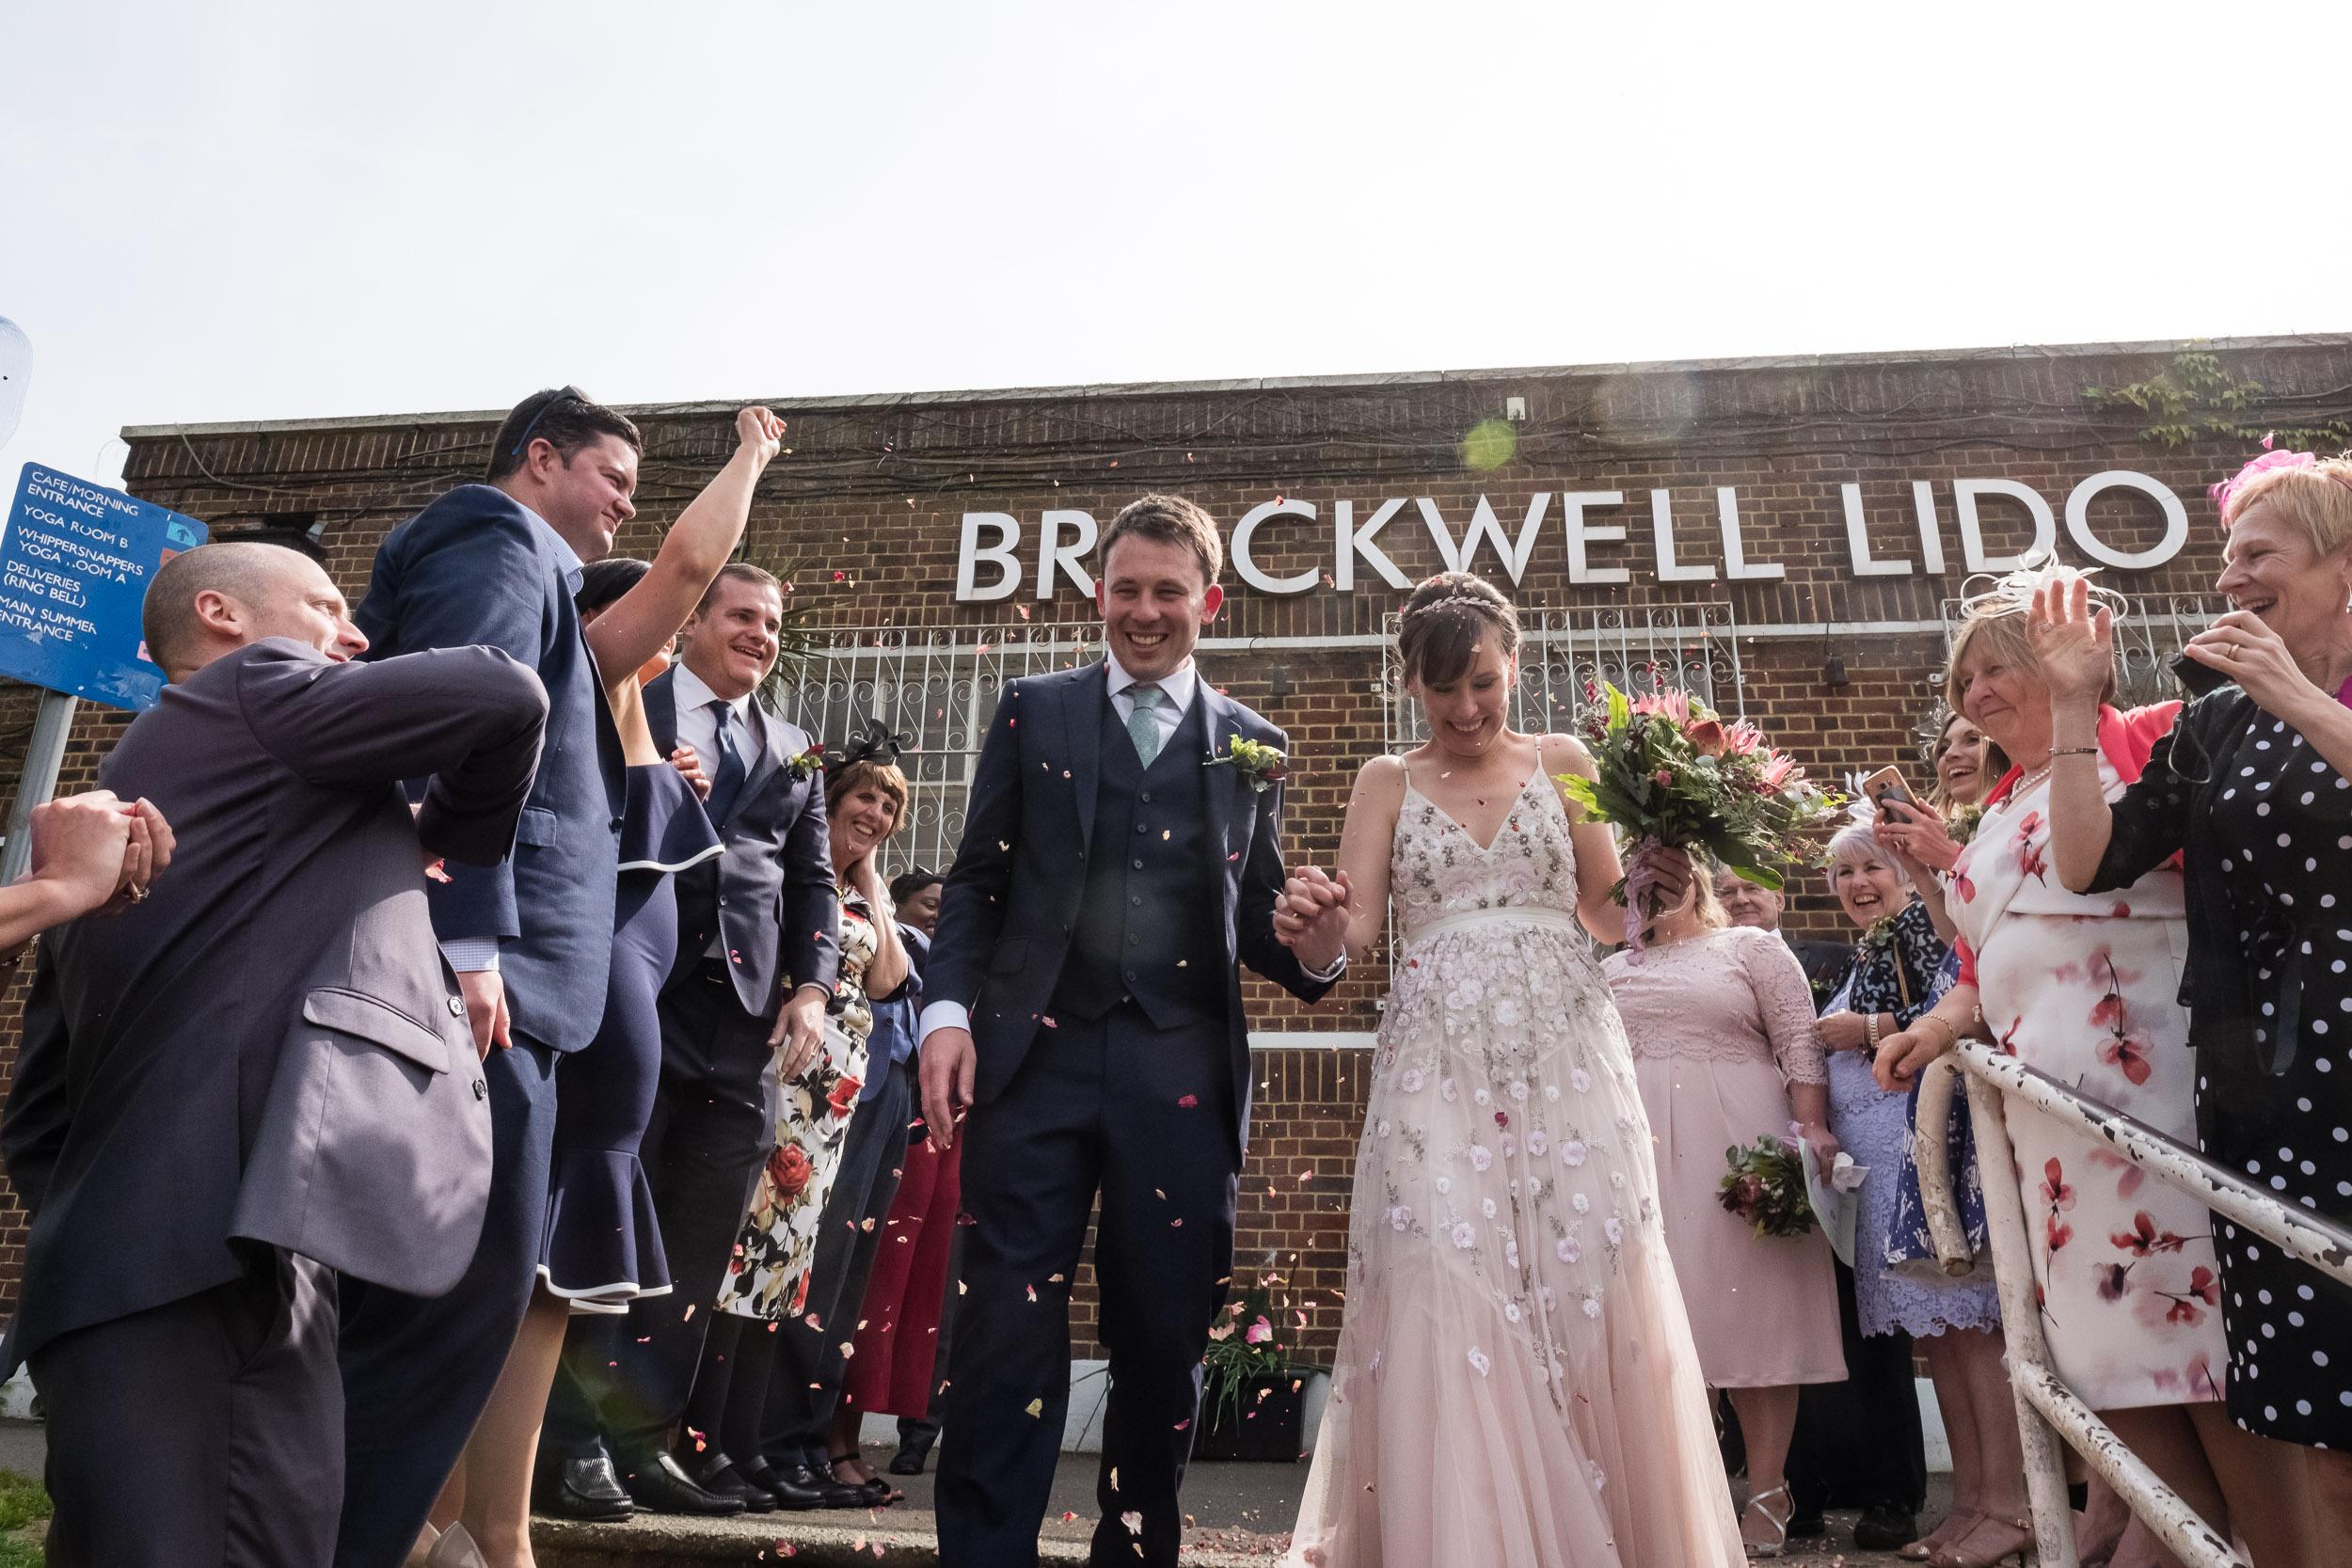 brockwell-lido-brixton-herne-hill-wedding-209.jpg